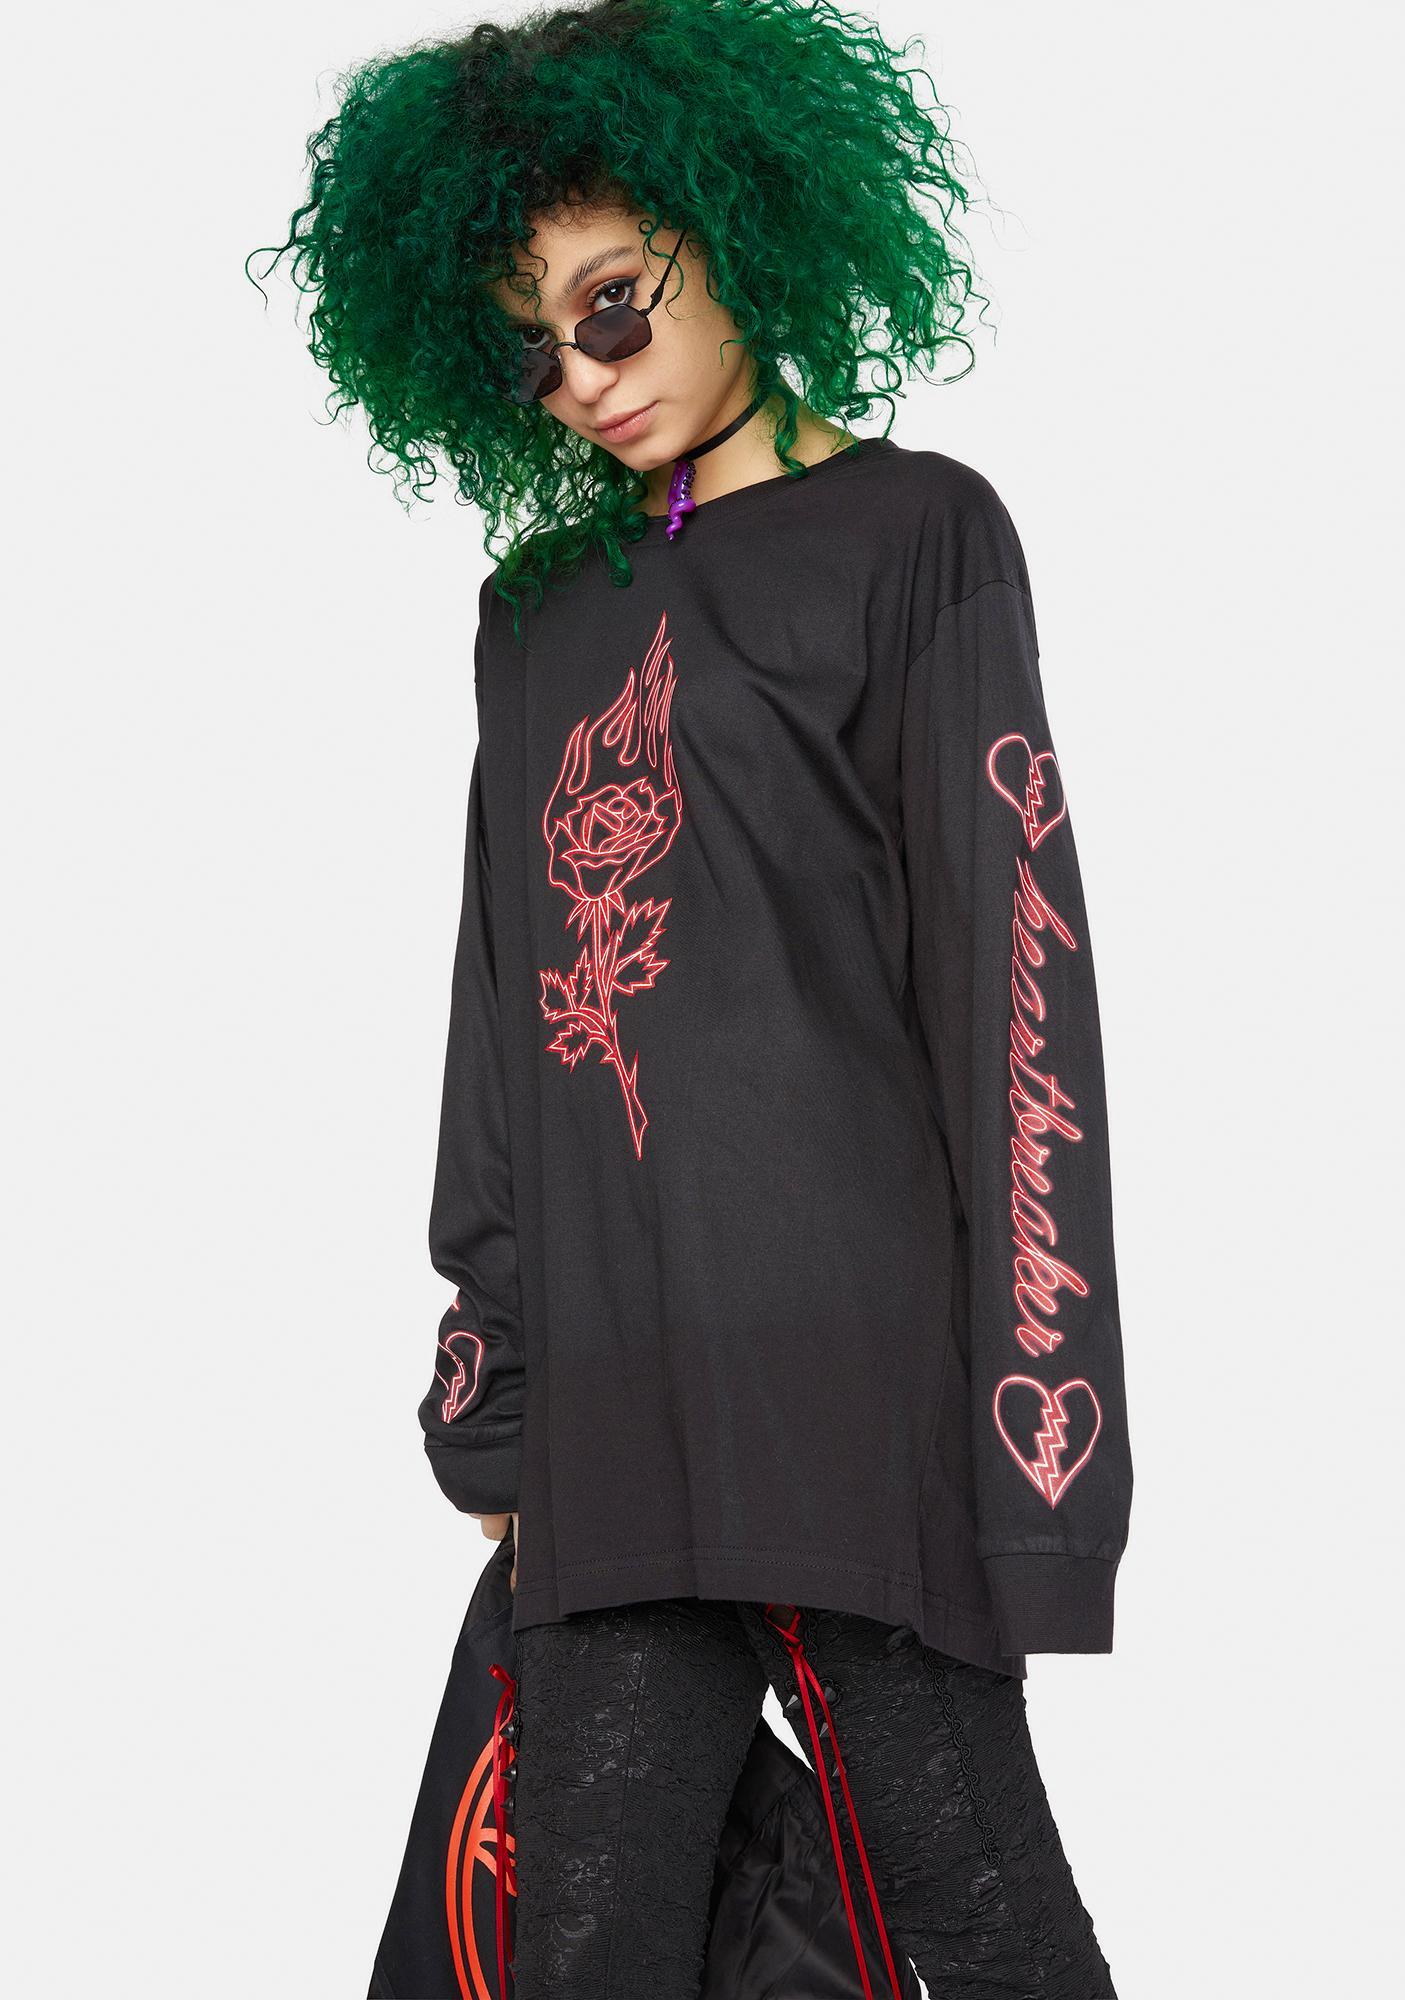 Long Clothing X Nympha Heartbreaker Long Sleeve Tee